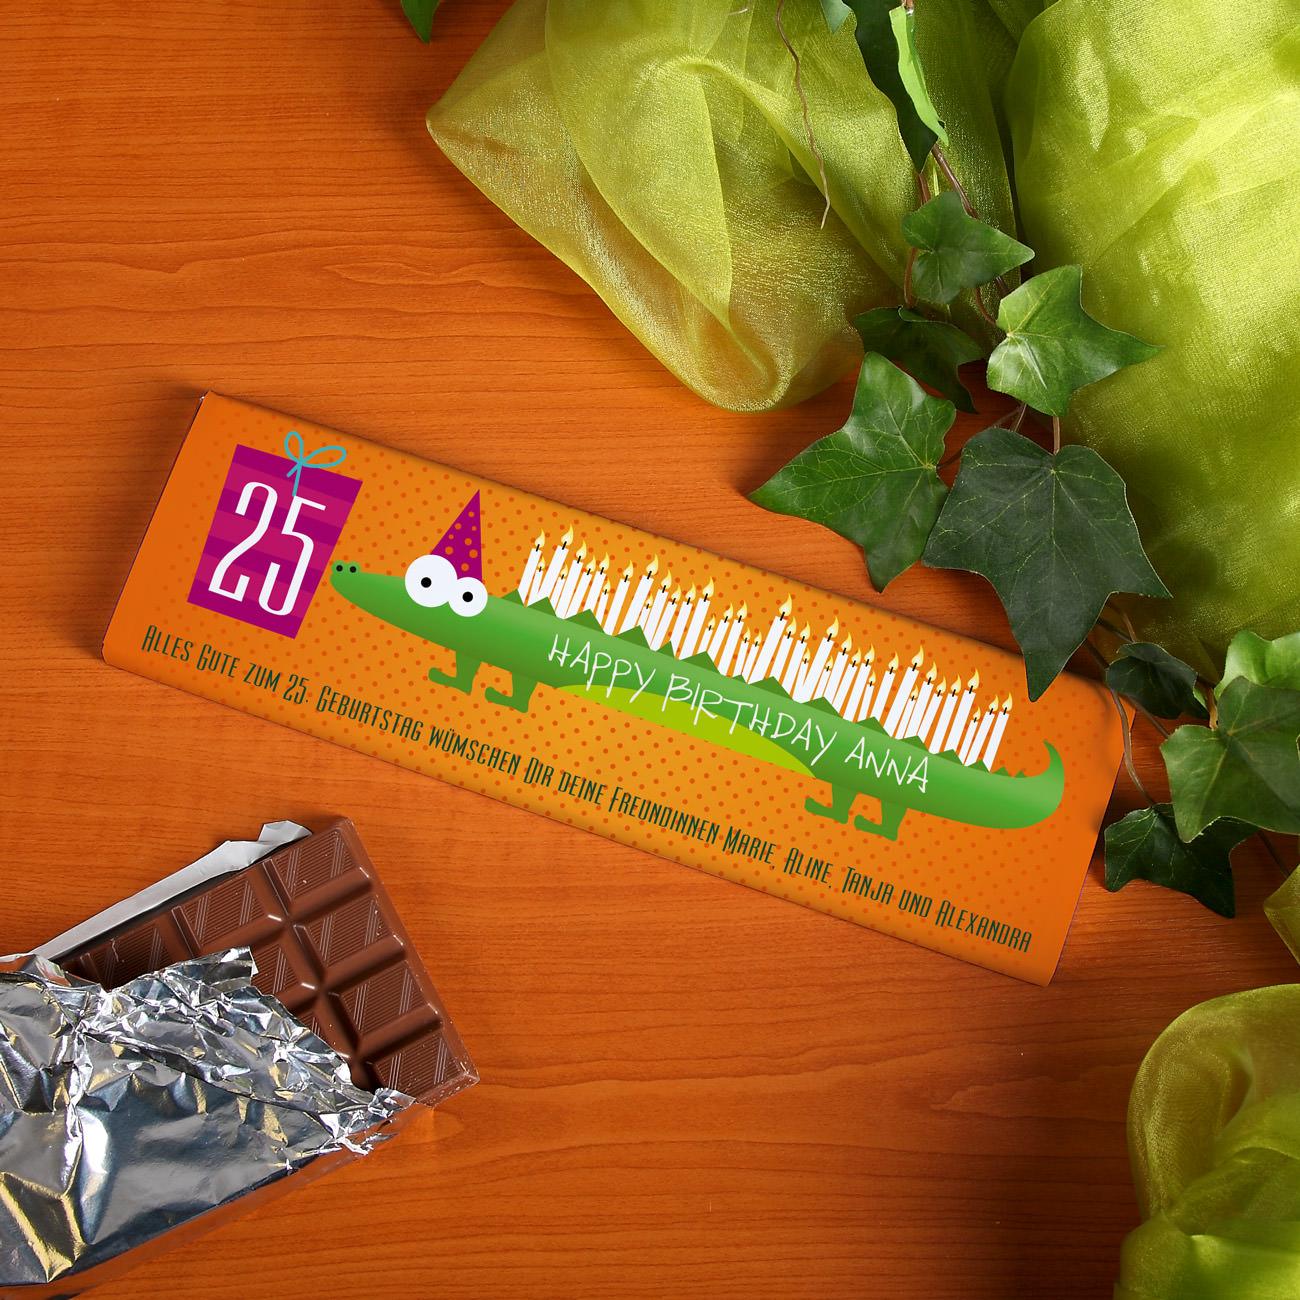 schokolade geschenke online